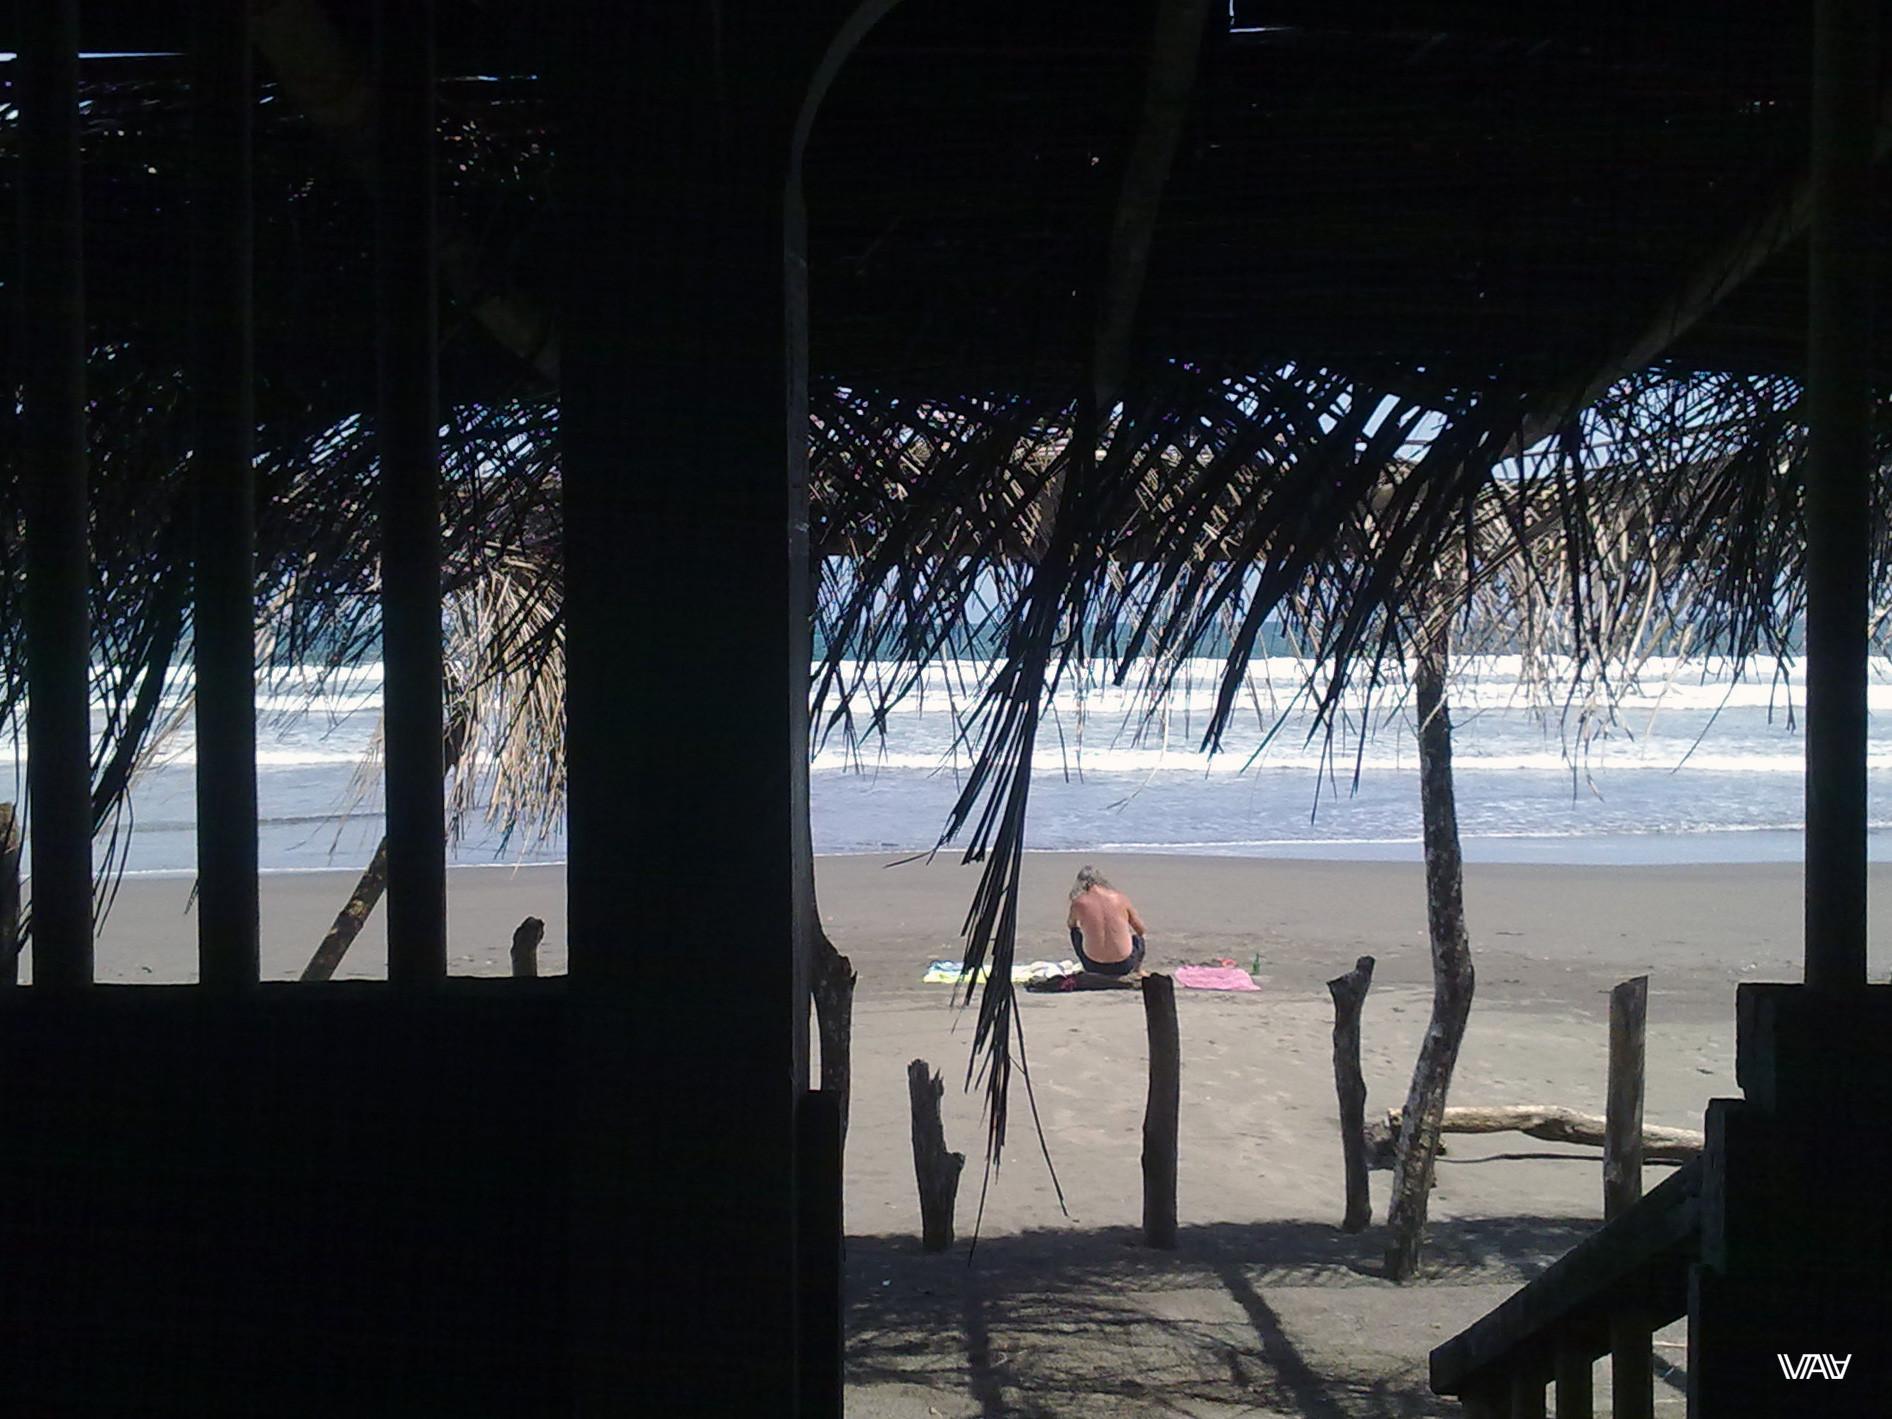 Винс рестораны не признавал даже на пляже) Лас Лахас, Панама